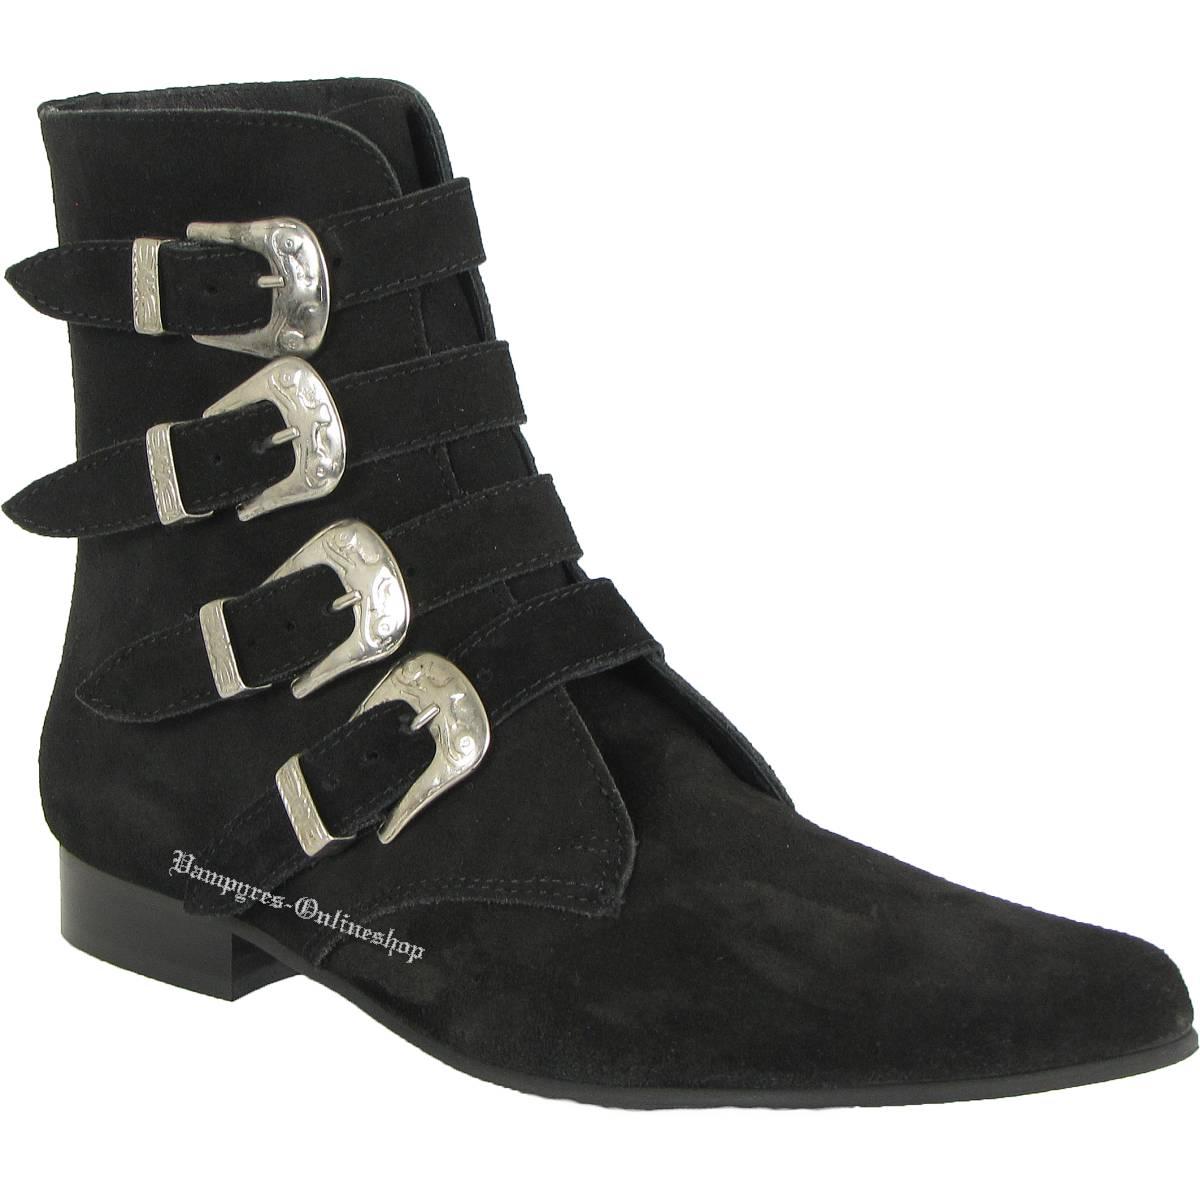 Boots & Braces Winkelpiker 4 Buckle Schwarz Wildleder Pikes